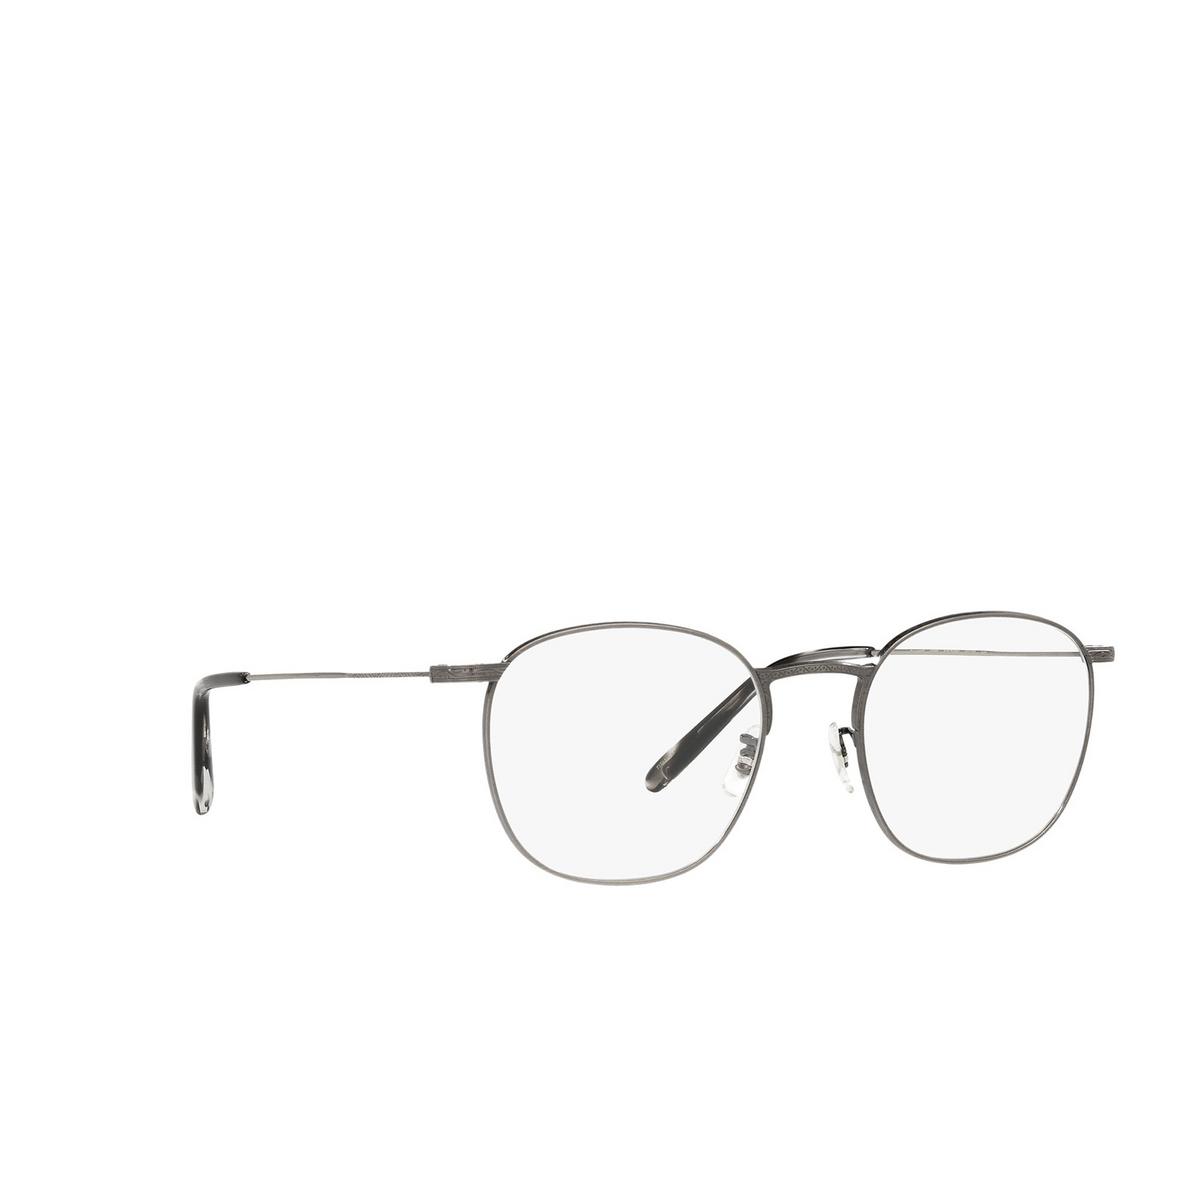 Oliver Peoples® Square Eyeglasses: Goldsen OV1285T color Antique Pewter 5289 - three-quarters view.